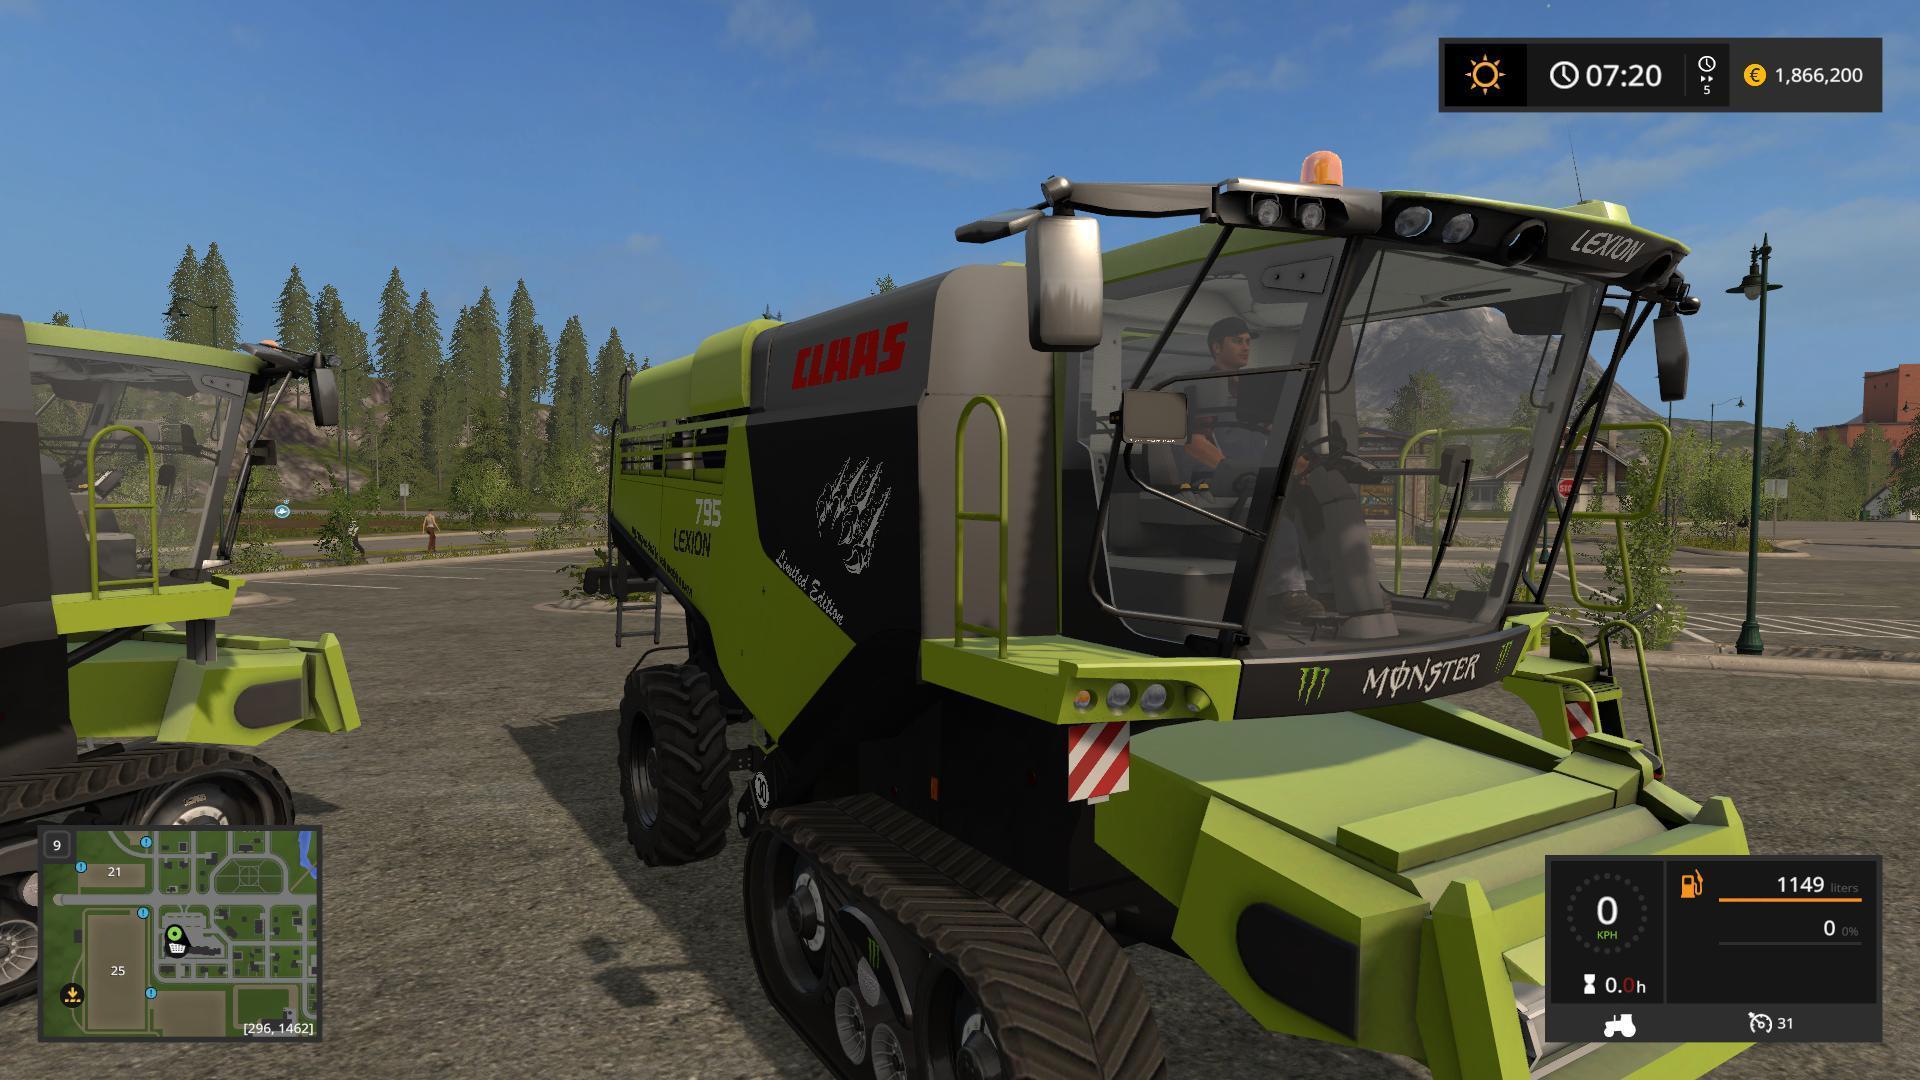 claas lexion 795 monster v1 0 ls 17 farming simulator 2017 mod fs 17 mod ls 17. Black Bedroom Furniture Sets. Home Design Ideas